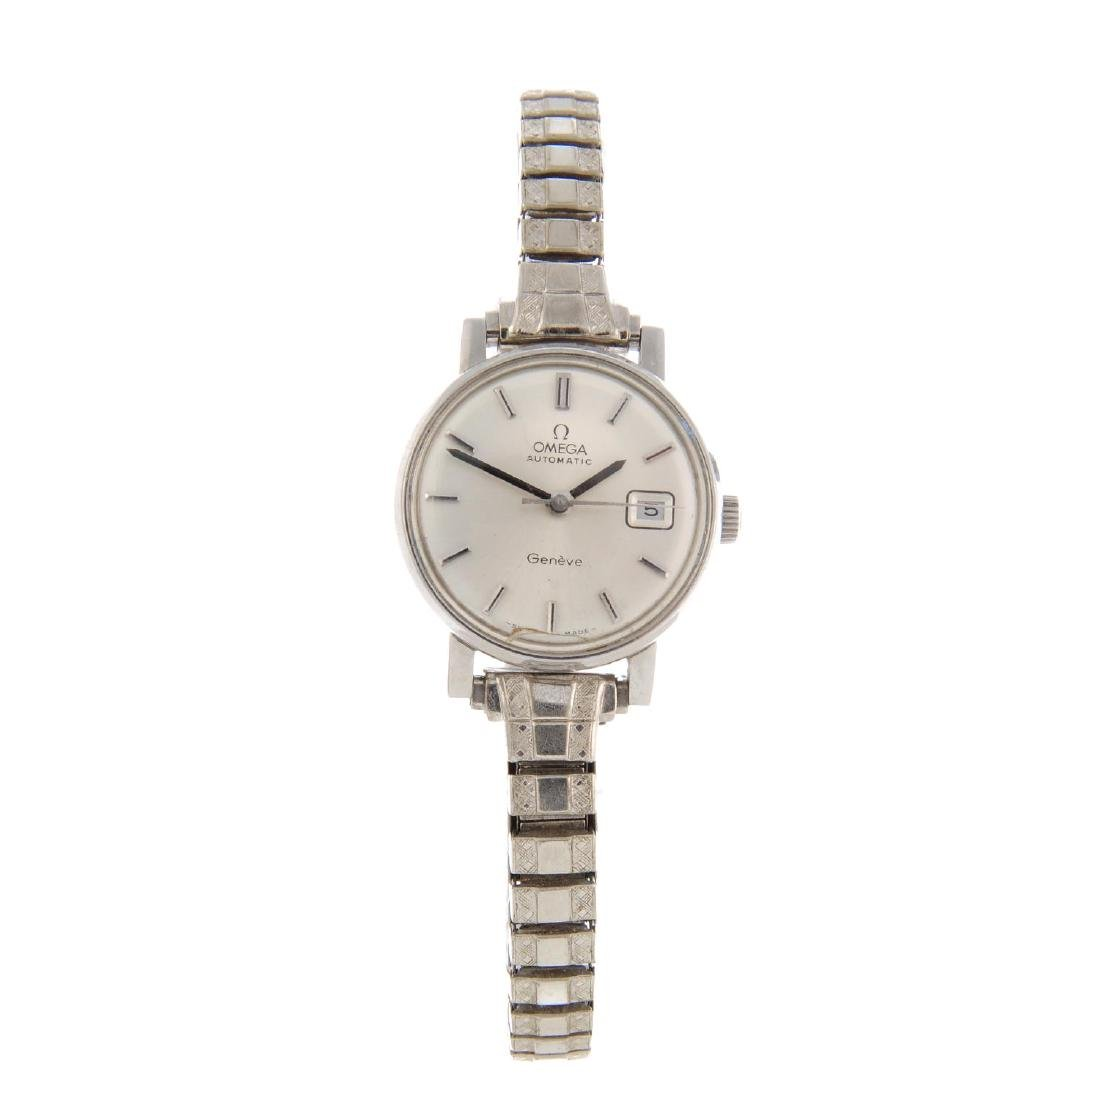 OMEGA - a lady's Genève bracelet watch. Stainless steel